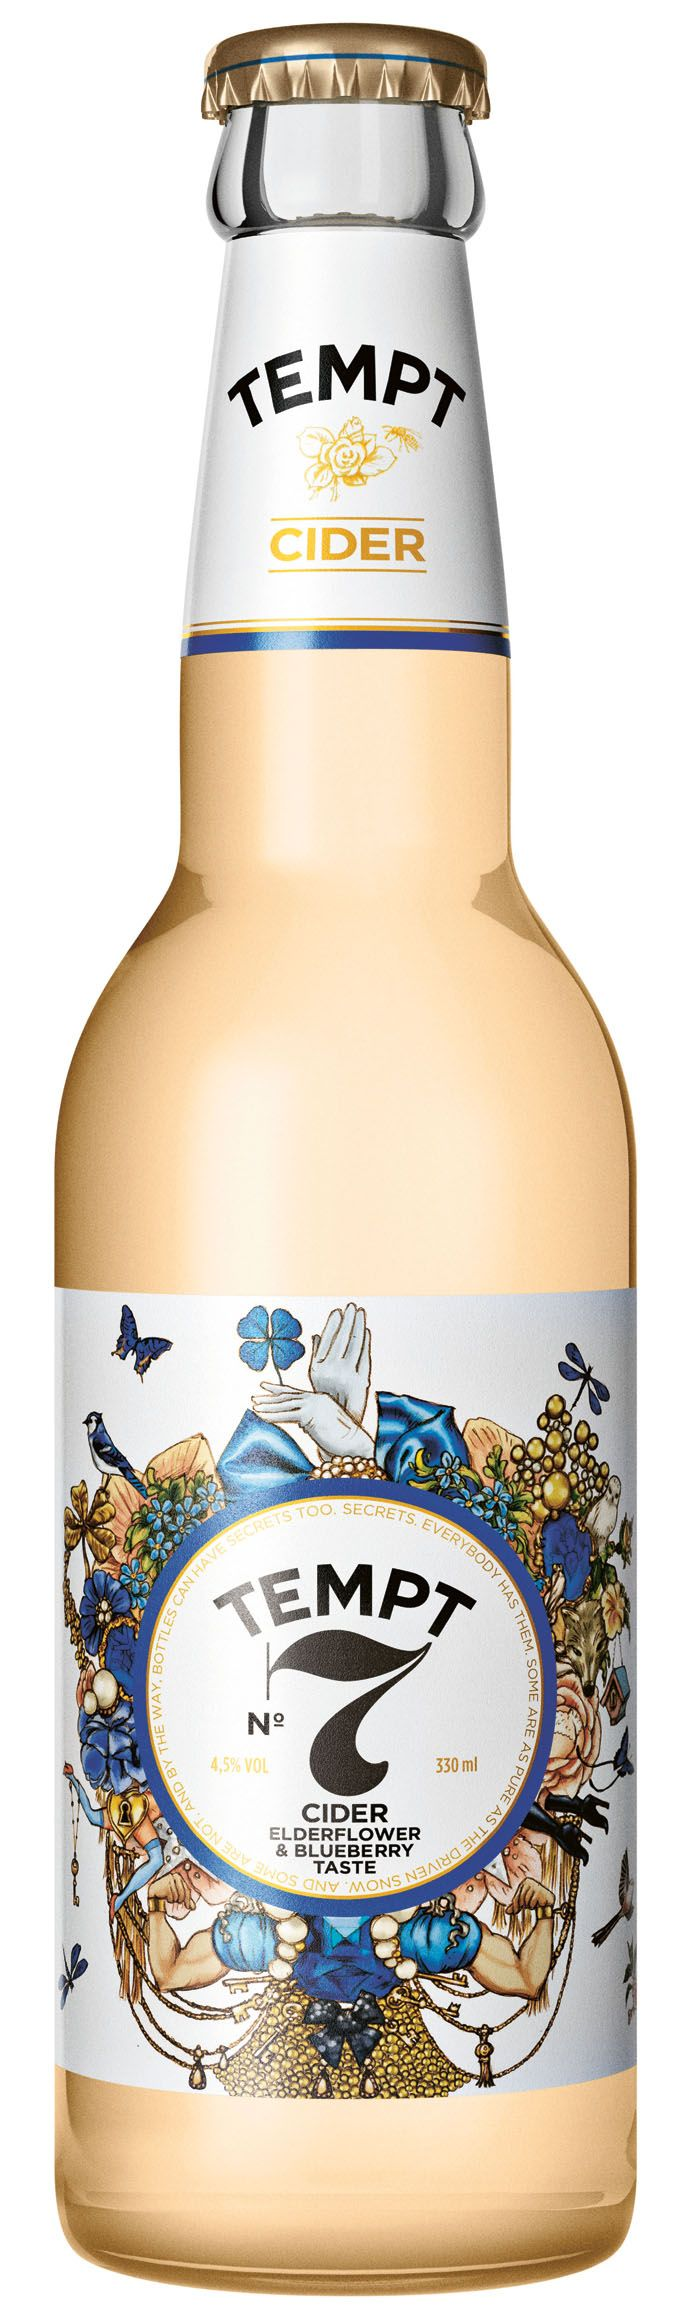 "Tempt Cider  www.LiquorList.com  ""The Marketplace for Adults with Taste"" @LiquorListcom   #LiquorList"